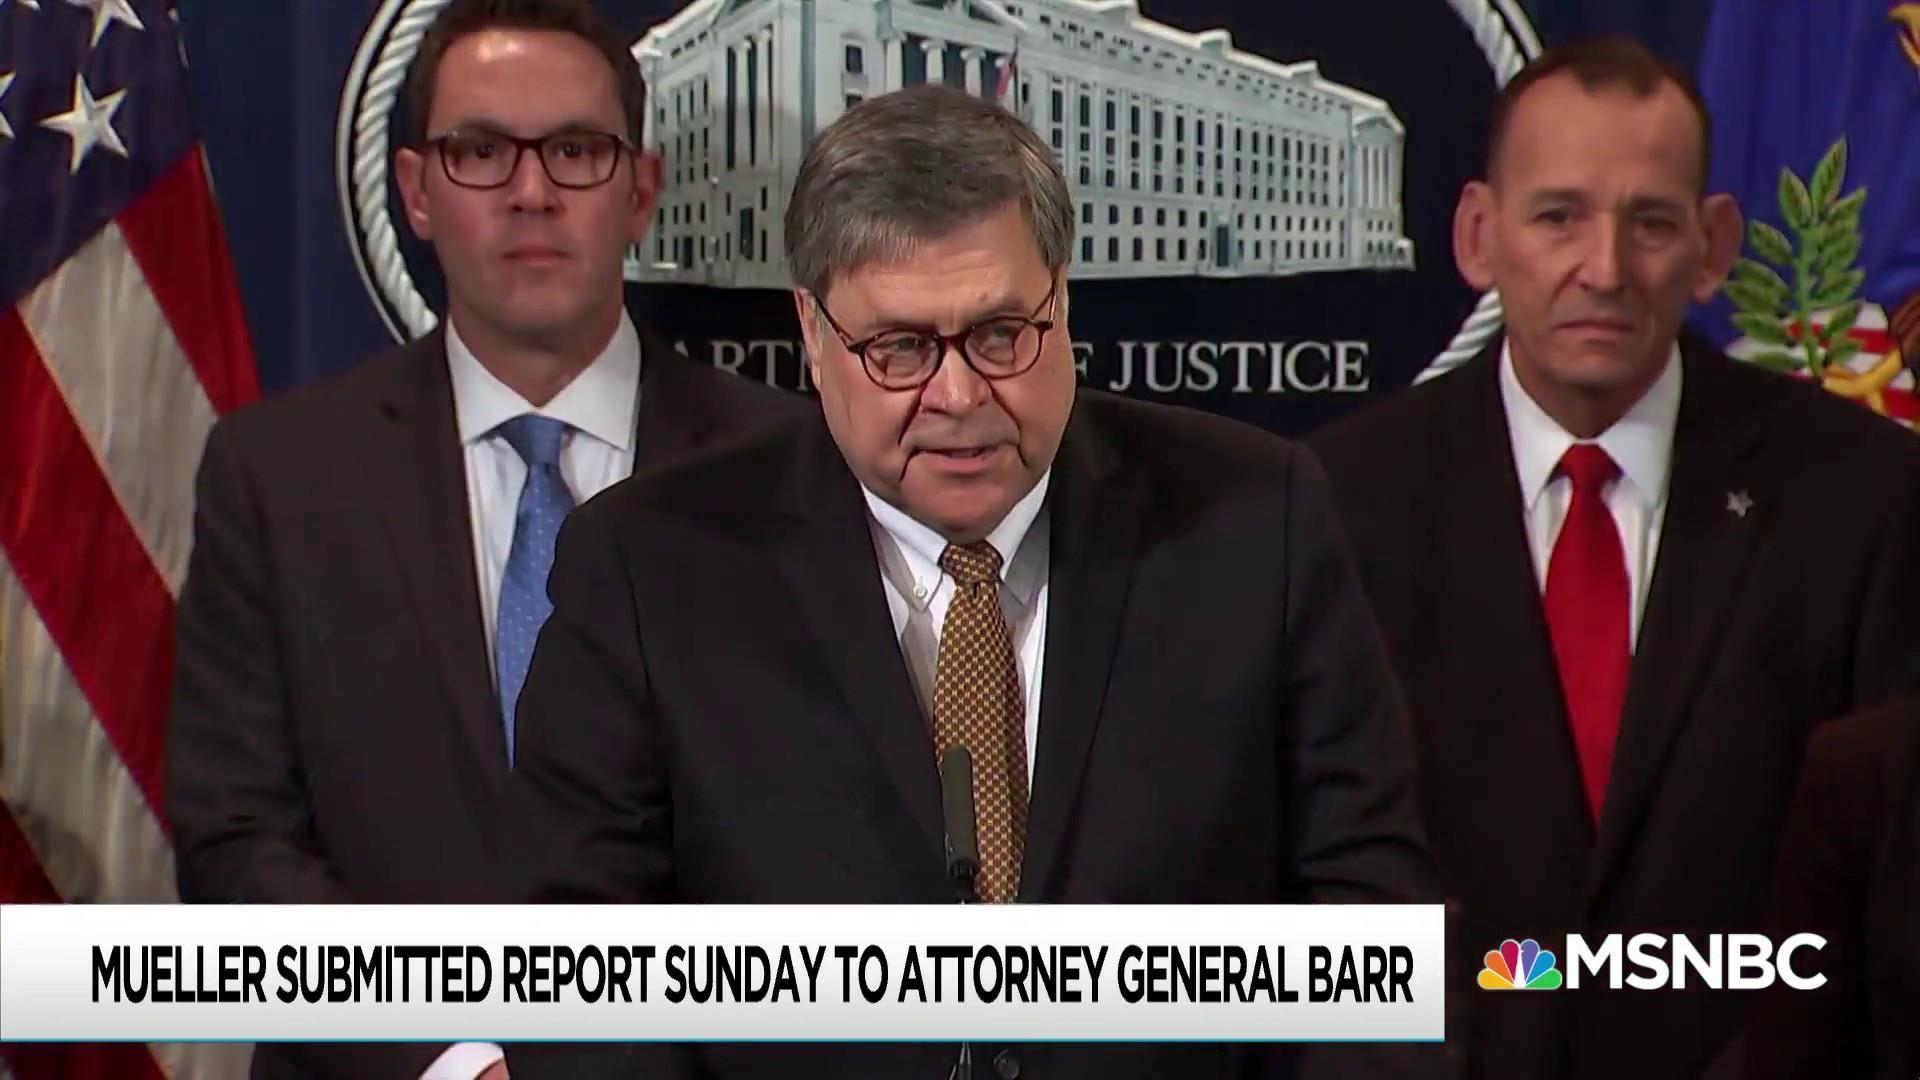 Low Trump credibility necessitates Mueller report's release